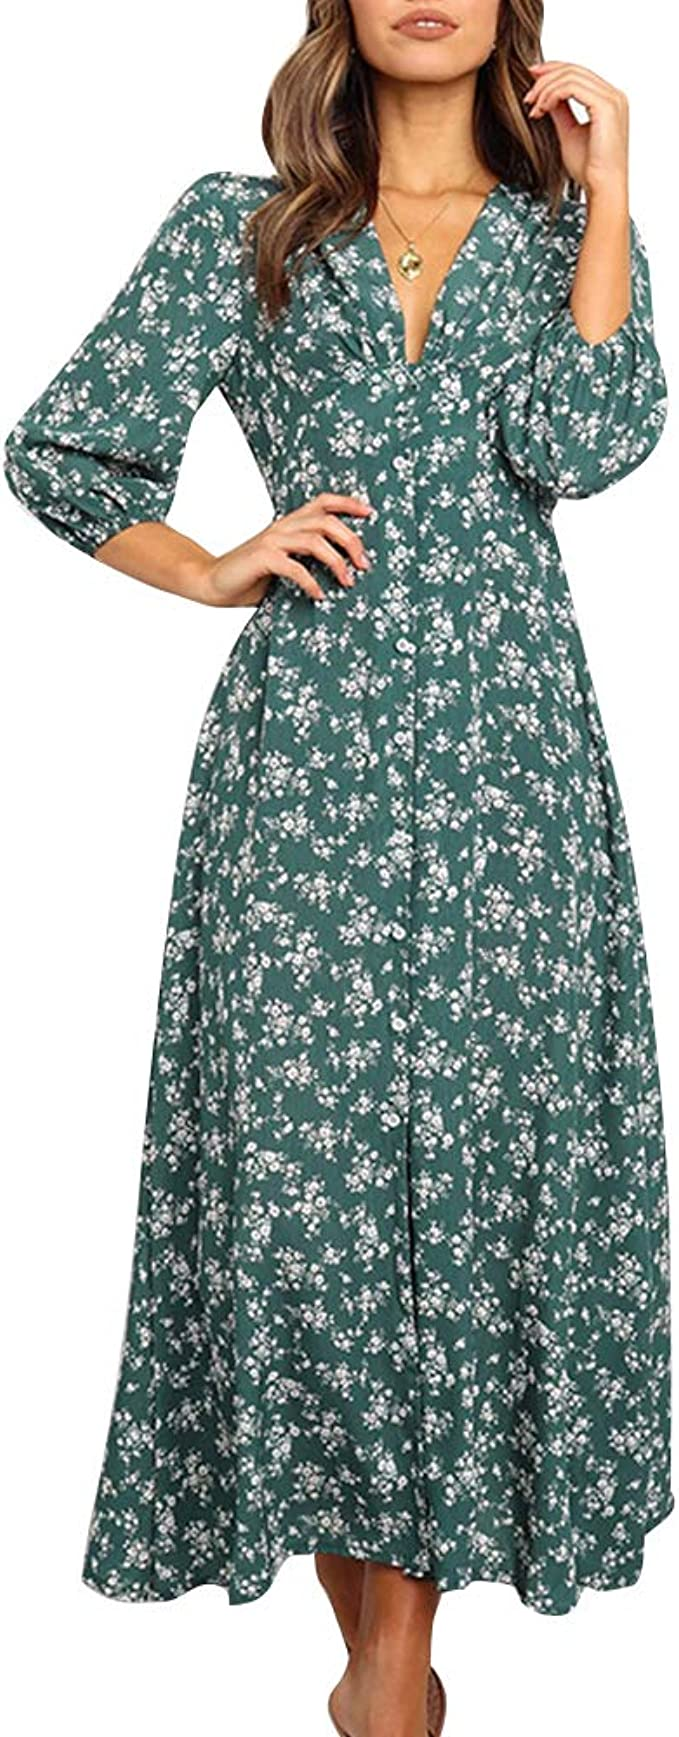 Sommerkleid Damen V-Ausschnitt Maxikleid Hemdkleid Lang Schick Elegant  Chiffon Gestreifte Langarm Blusenkleid Shirt Kleid Oberteil Kleid  Strandkleid